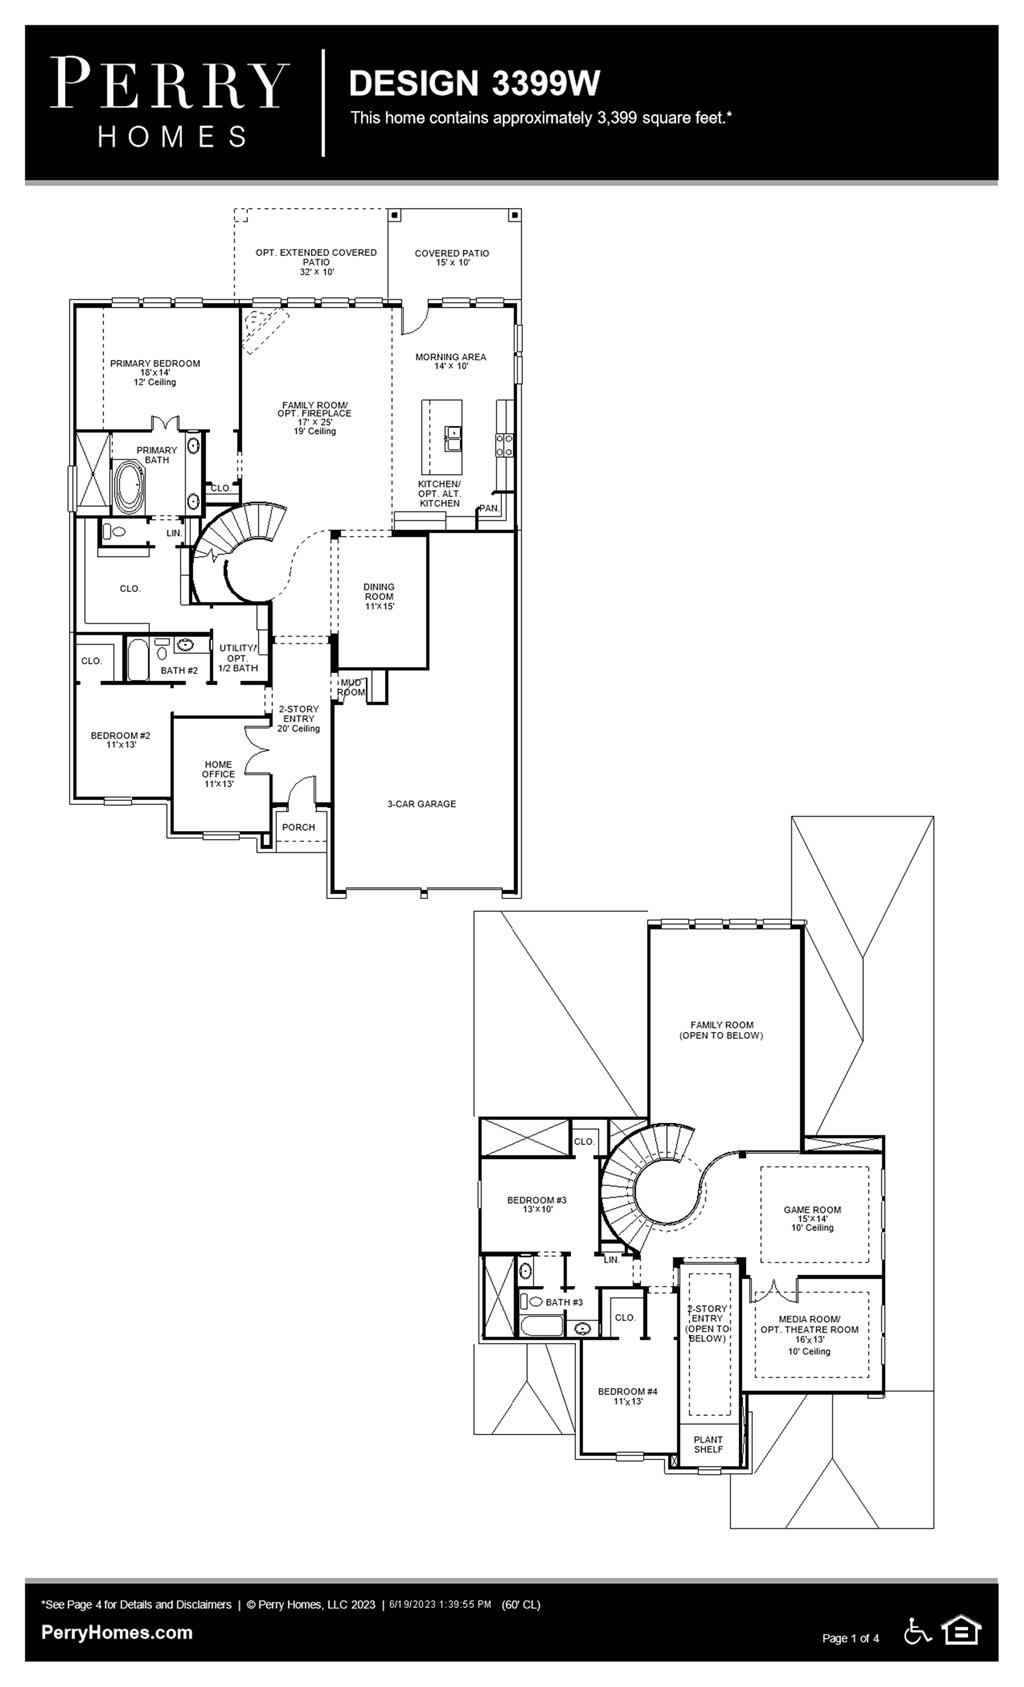 Floor Plan for 3399W